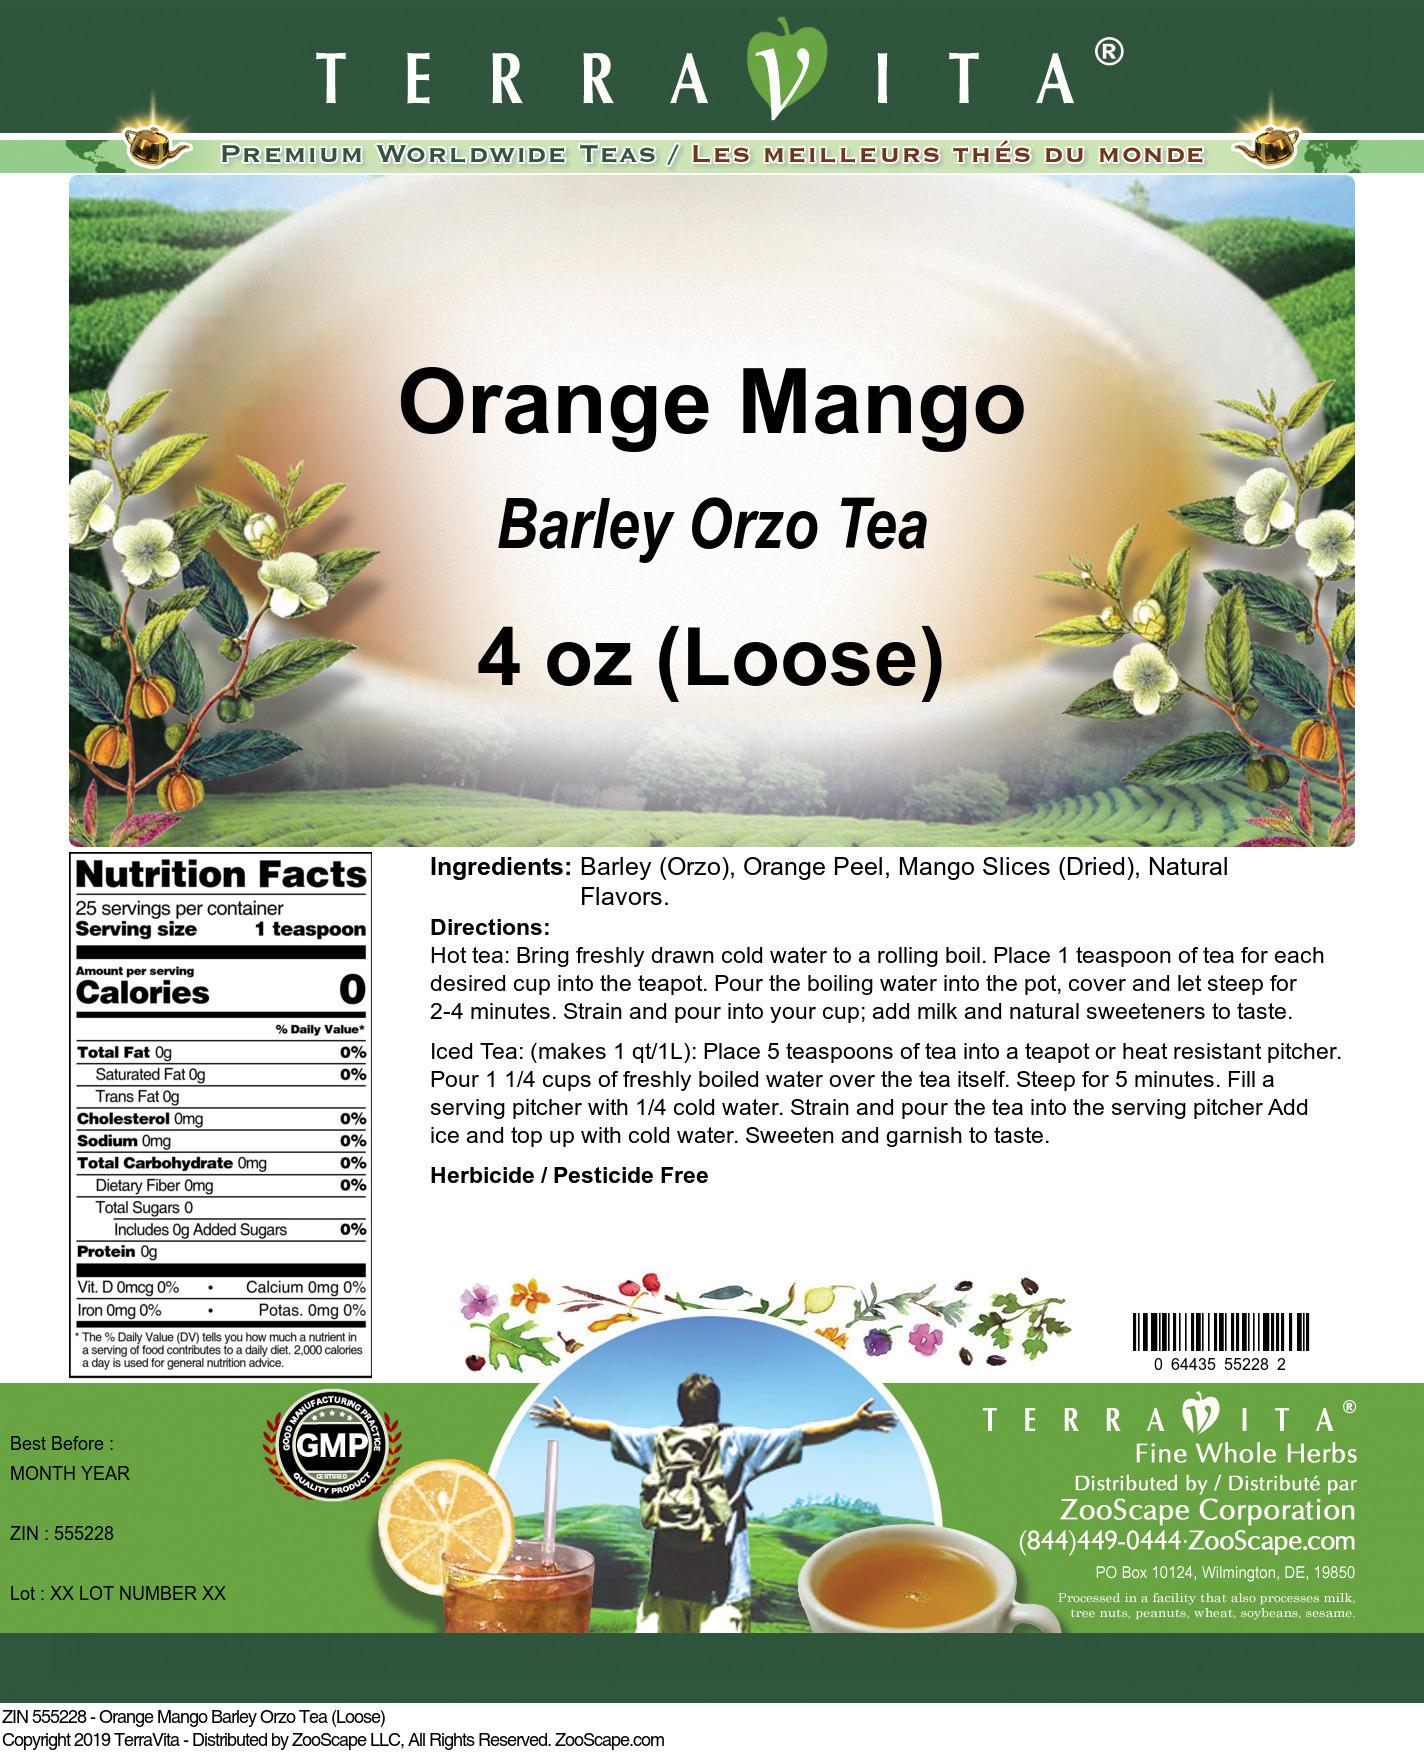 Orange Mango Barley Orzo Tea (Loose)